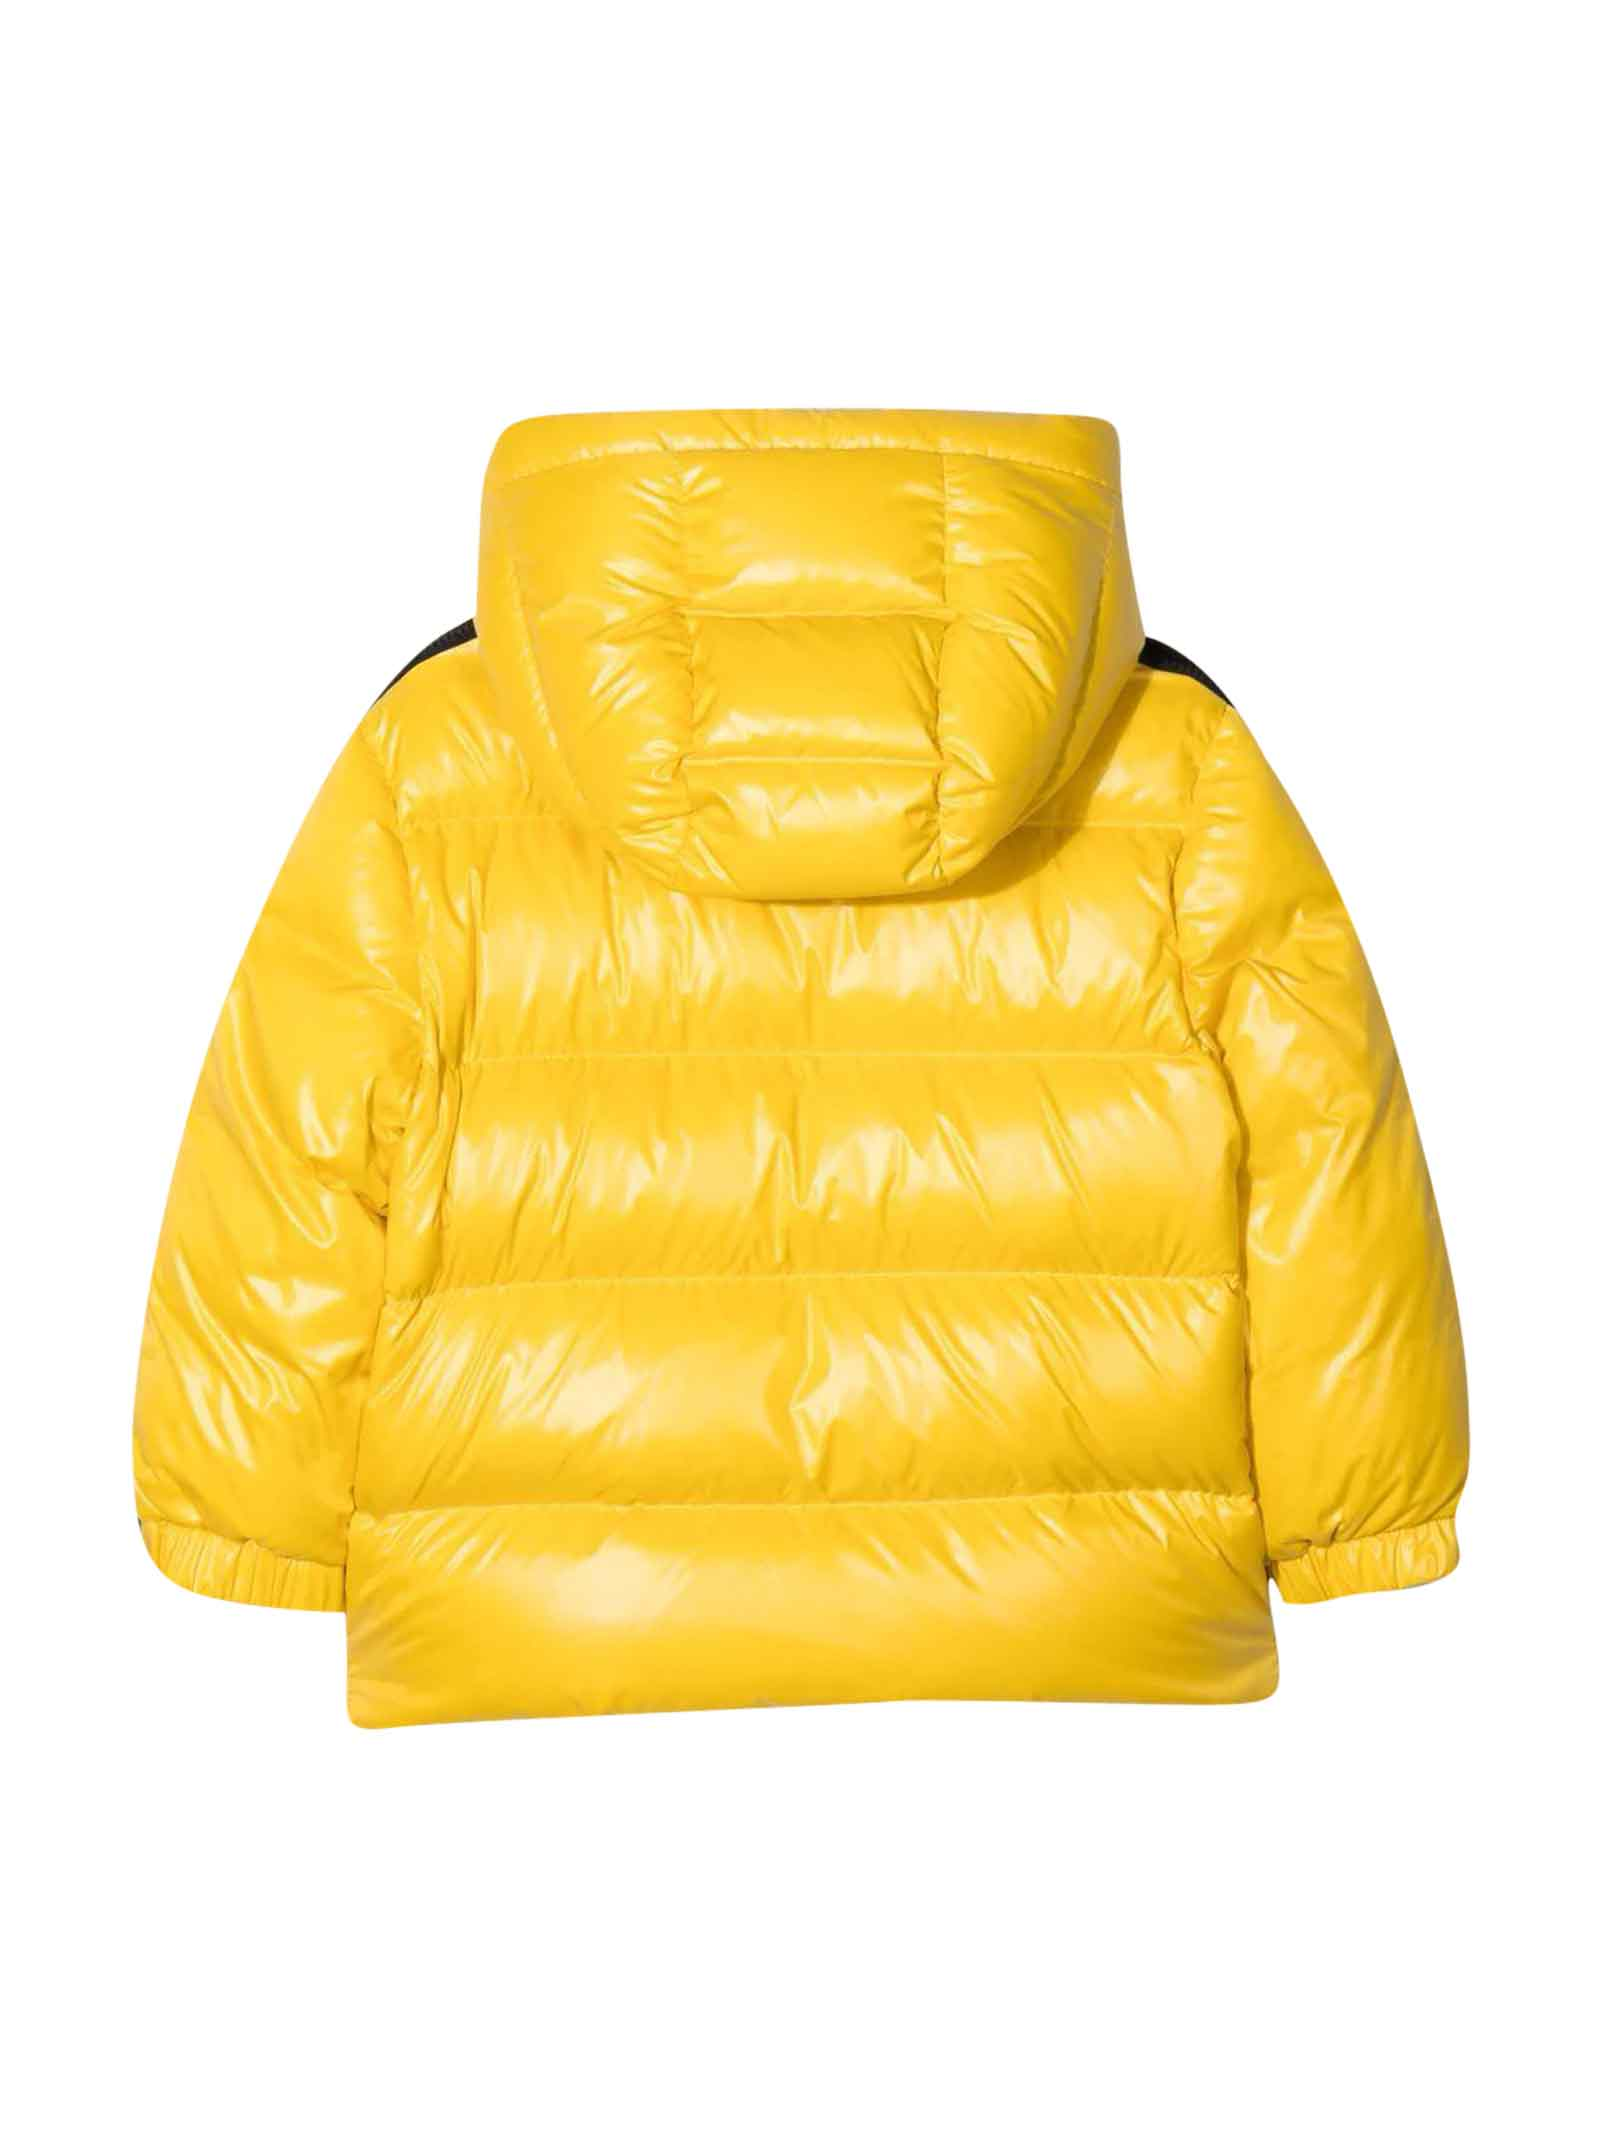 Moncler Yellow Lightweight Jacket Unisex